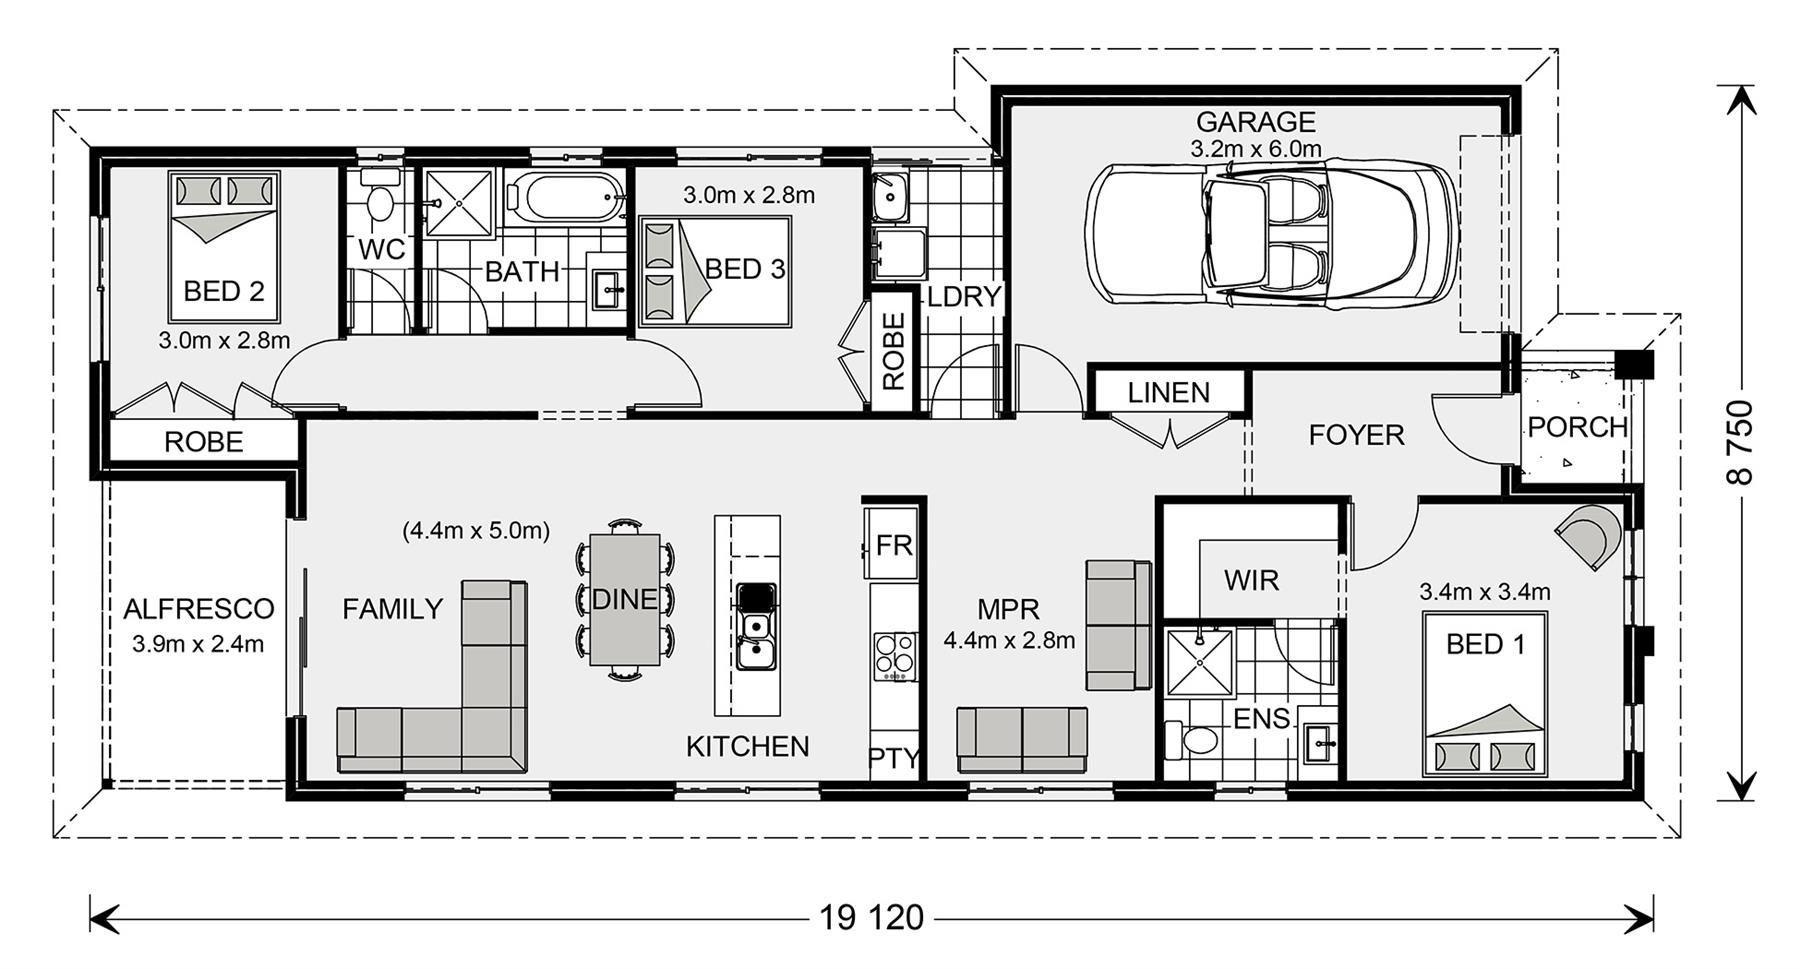 Lot 61 Bowline Court, Coronet Bay VIC 3984, Image 1